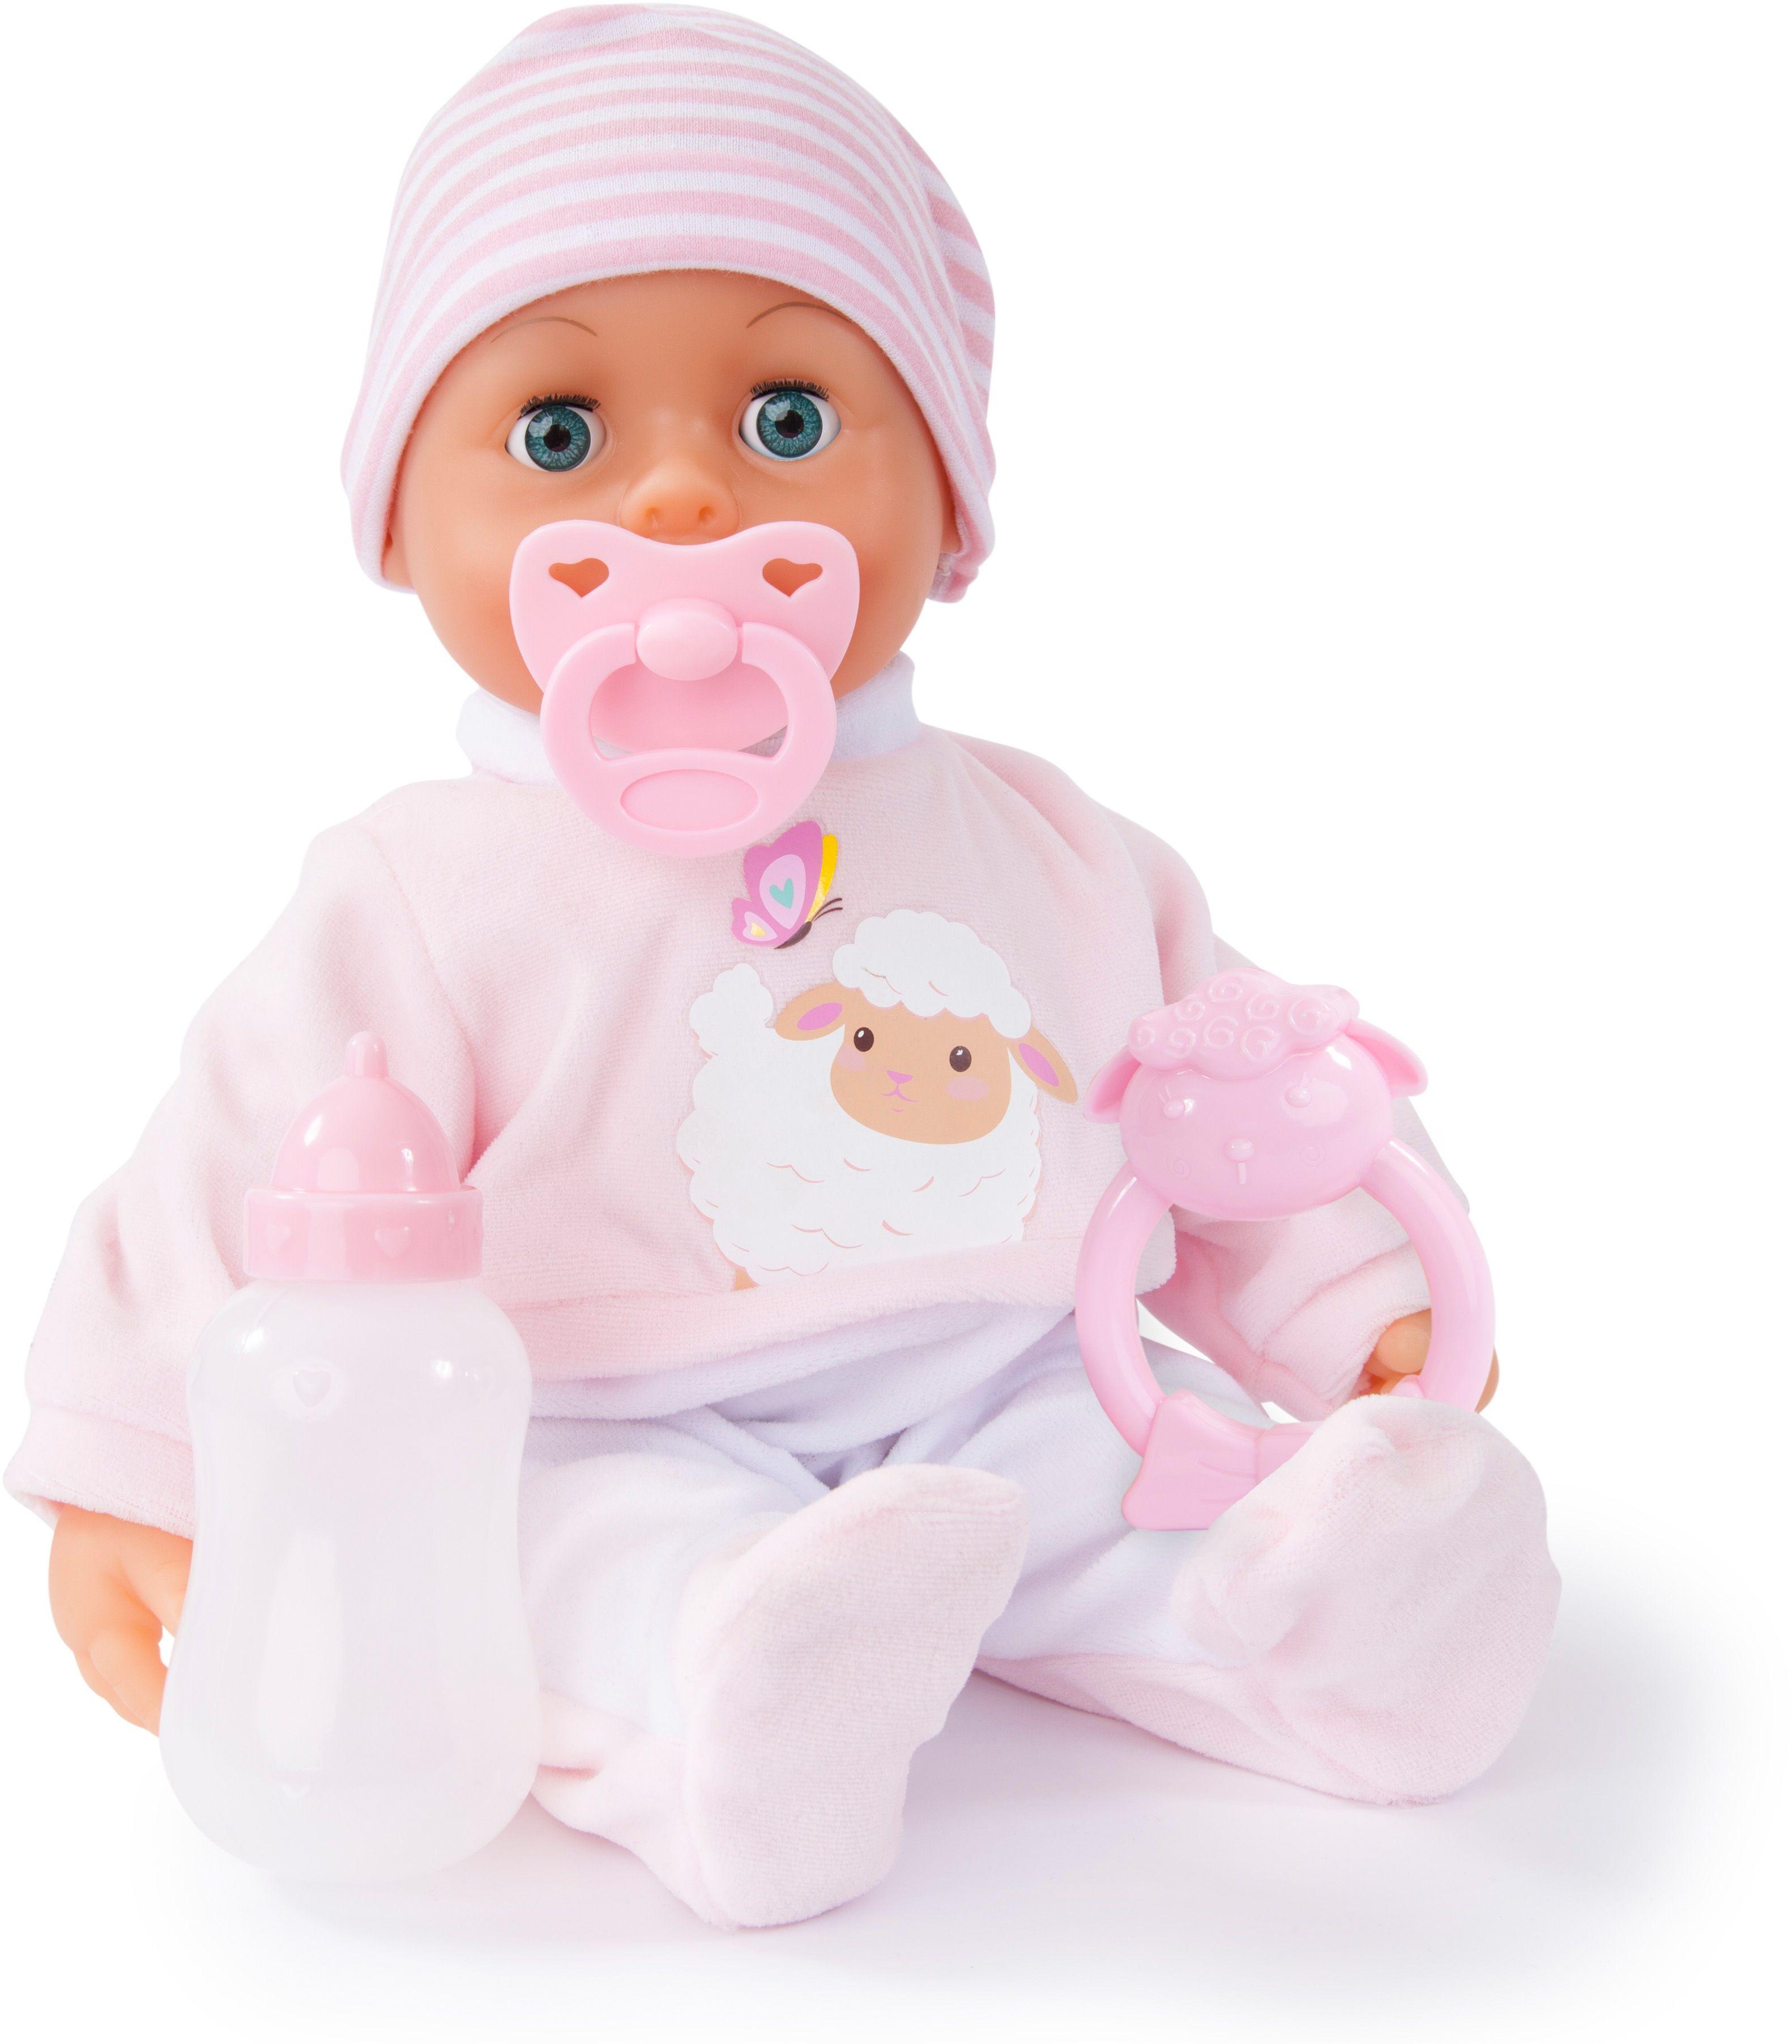 Bayer Design Пупс Малыш  мои первые слова 38 см 93824AA - Куклы и аксессуары